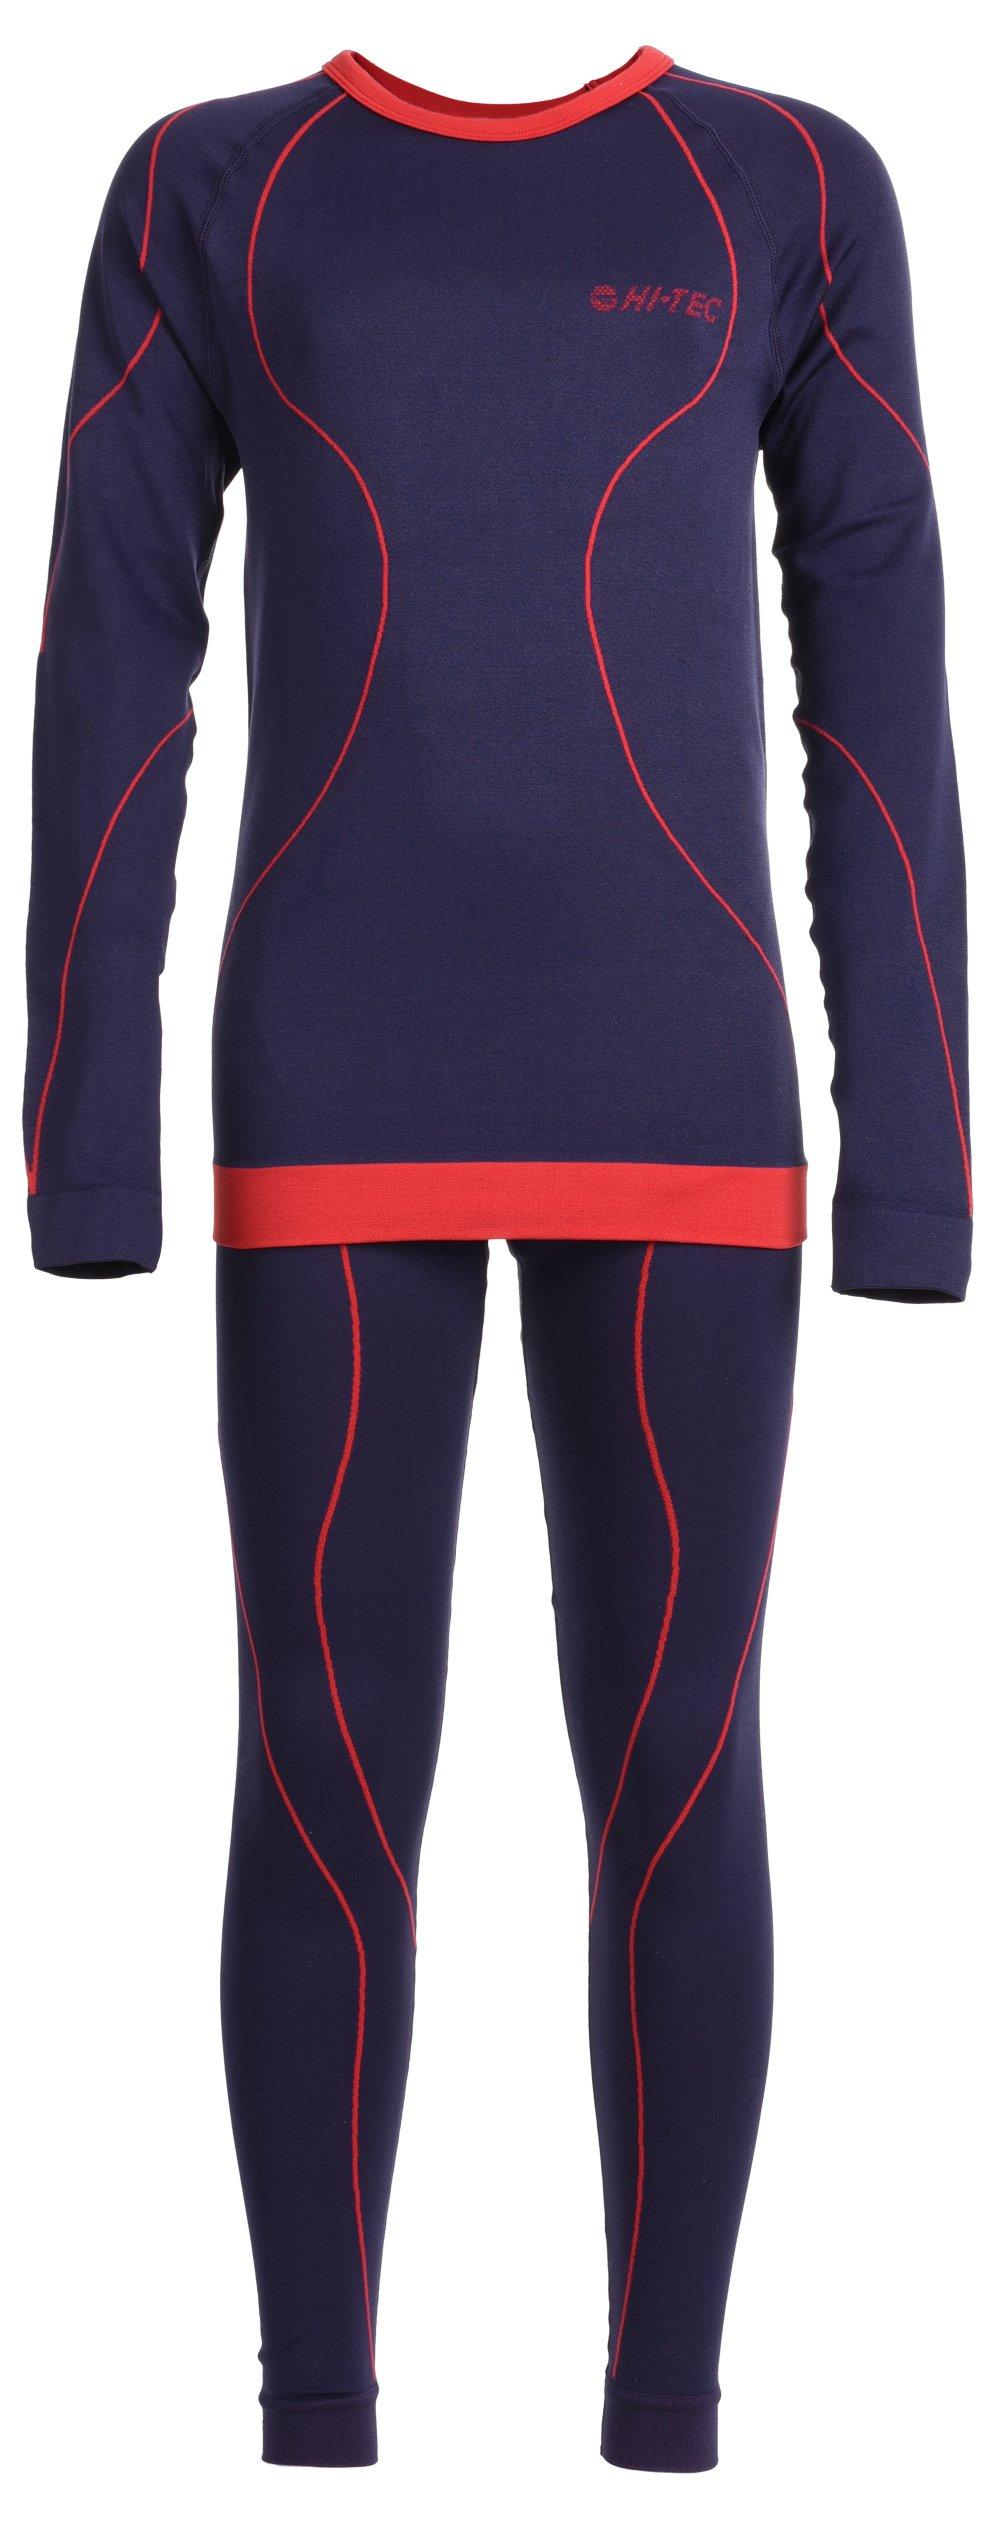 HI-TEC Kinder Underwear/set Ibar Set, Patriot blue/Racing, 146, 68928